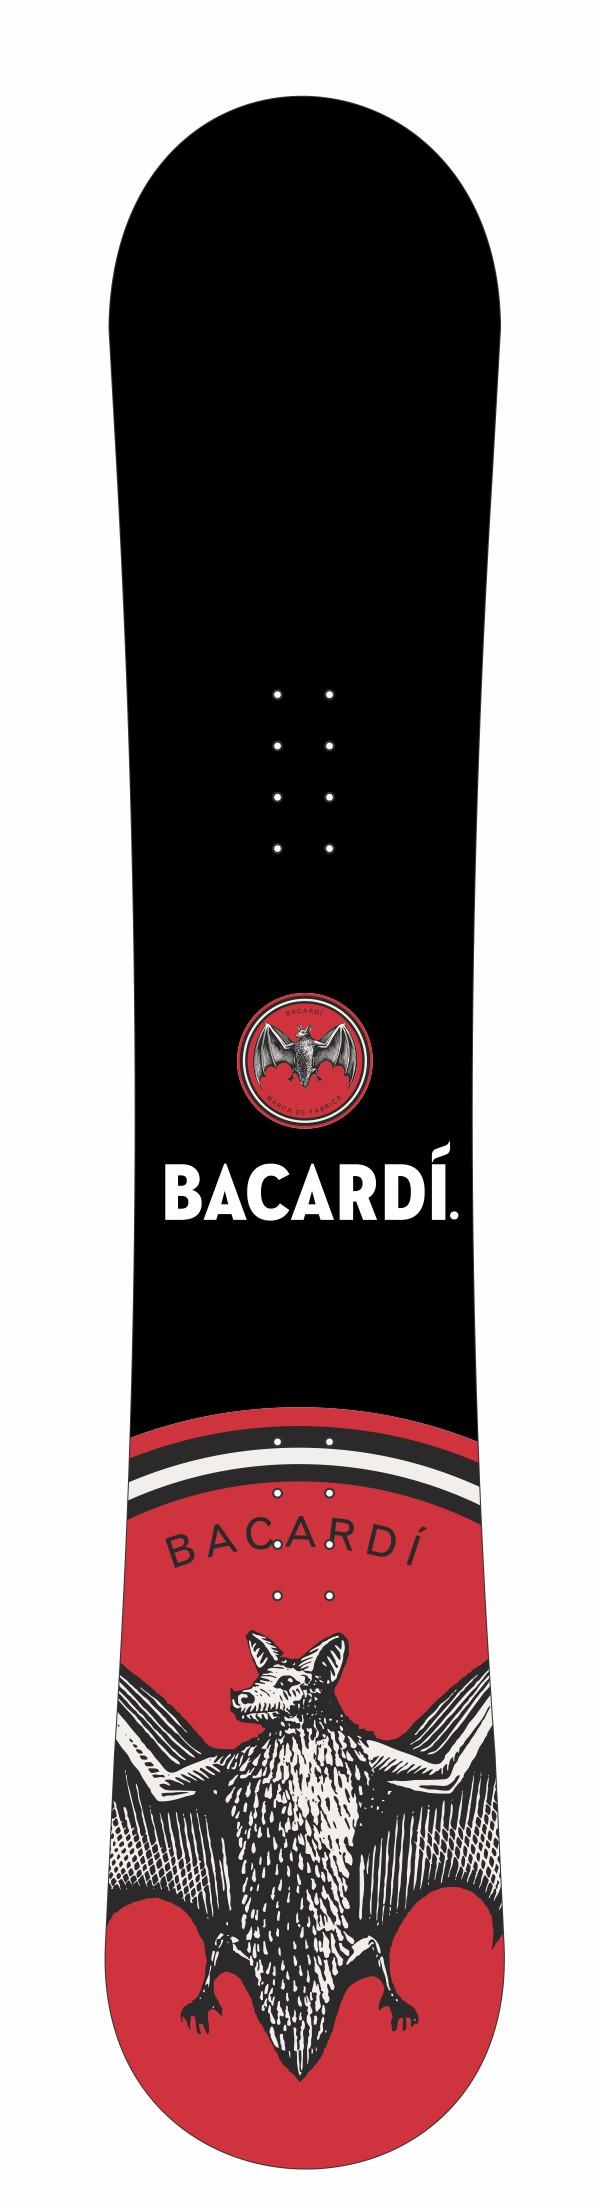 Bacardi Snowboard.jpg